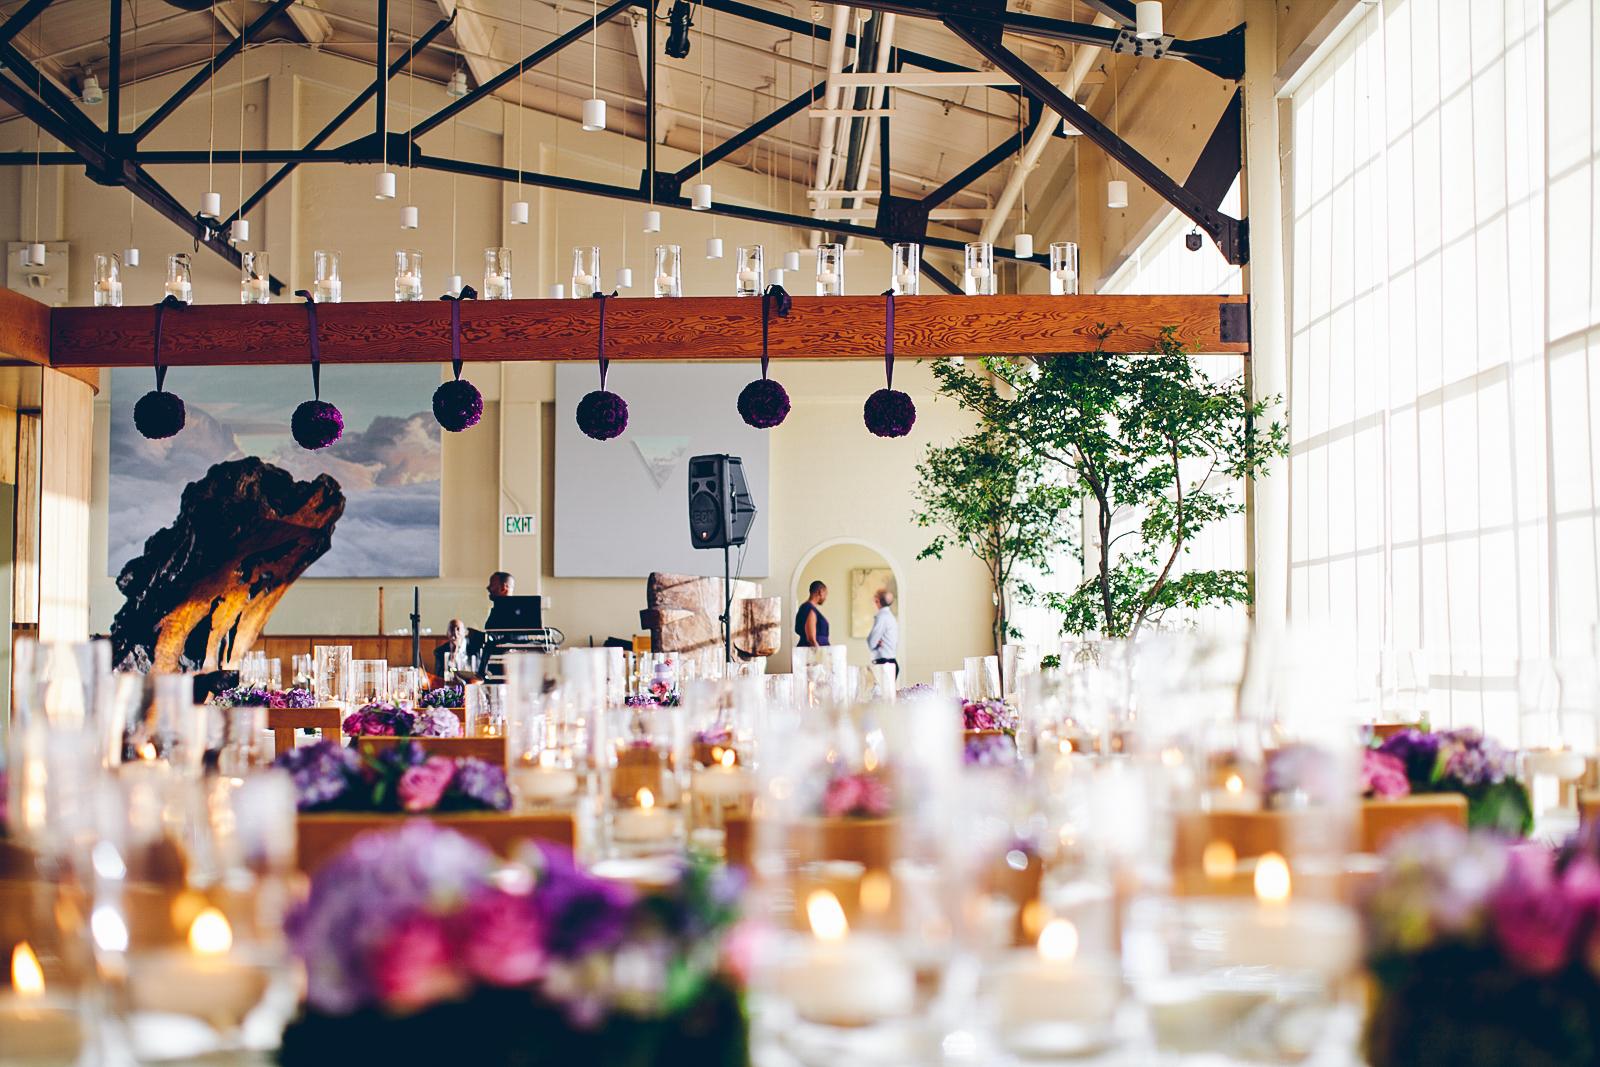 greens_restaurant_wedding_photography_san_franscisco_ebony_siovhan_bokeh_photography_33.jpg